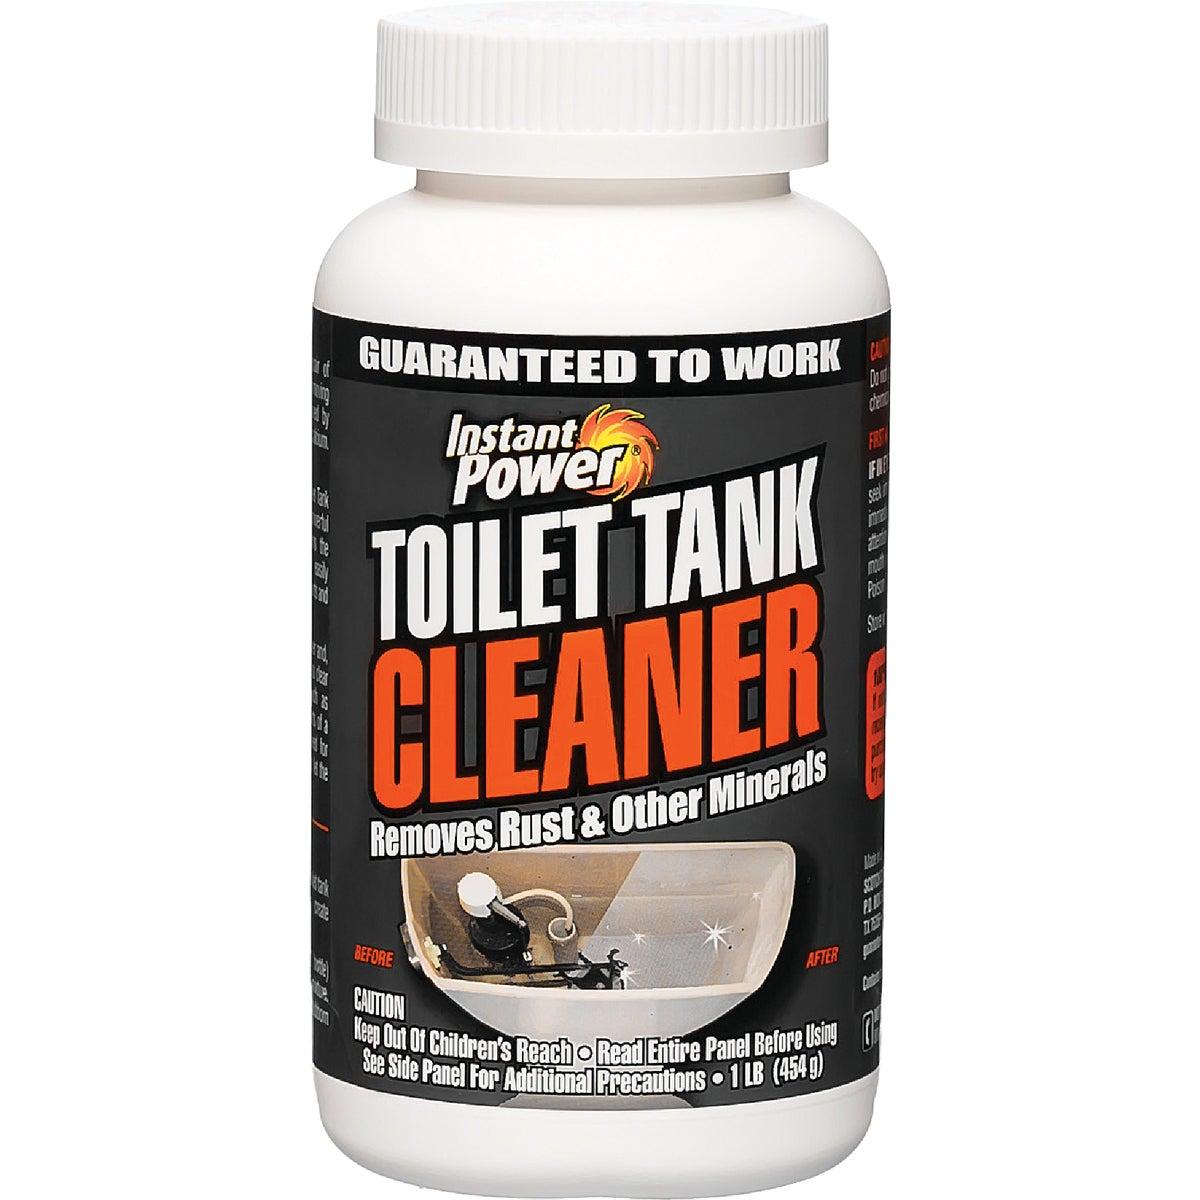 Toilet Tank Cleaner